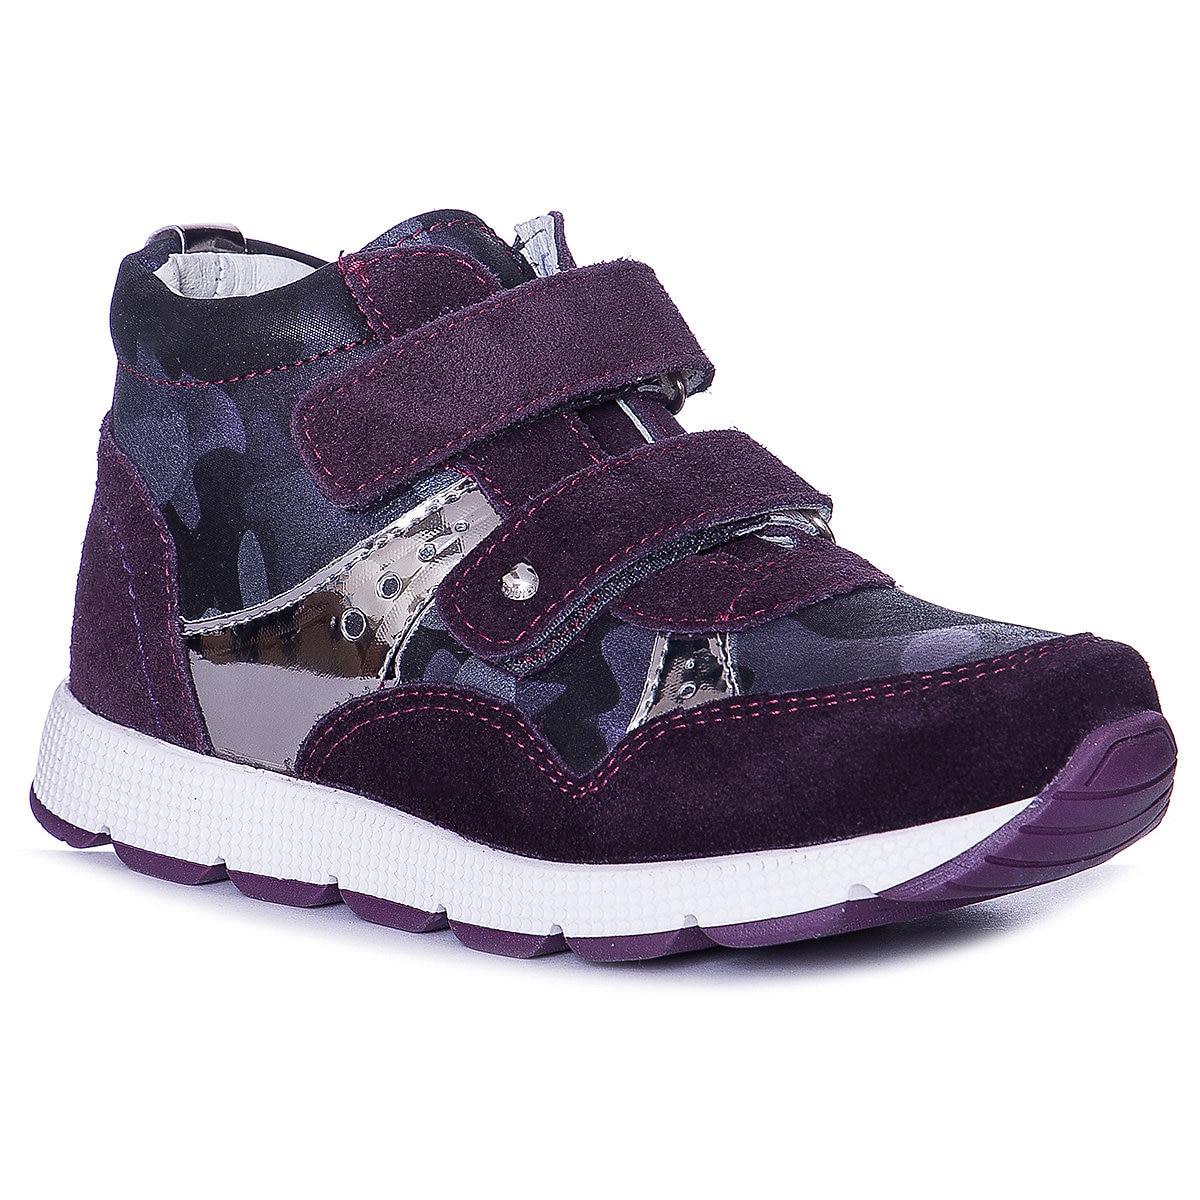 KOTOFEY Kids' Sneakers 10813980 Children's Sports Running Shoes Spring Autumn Lavender